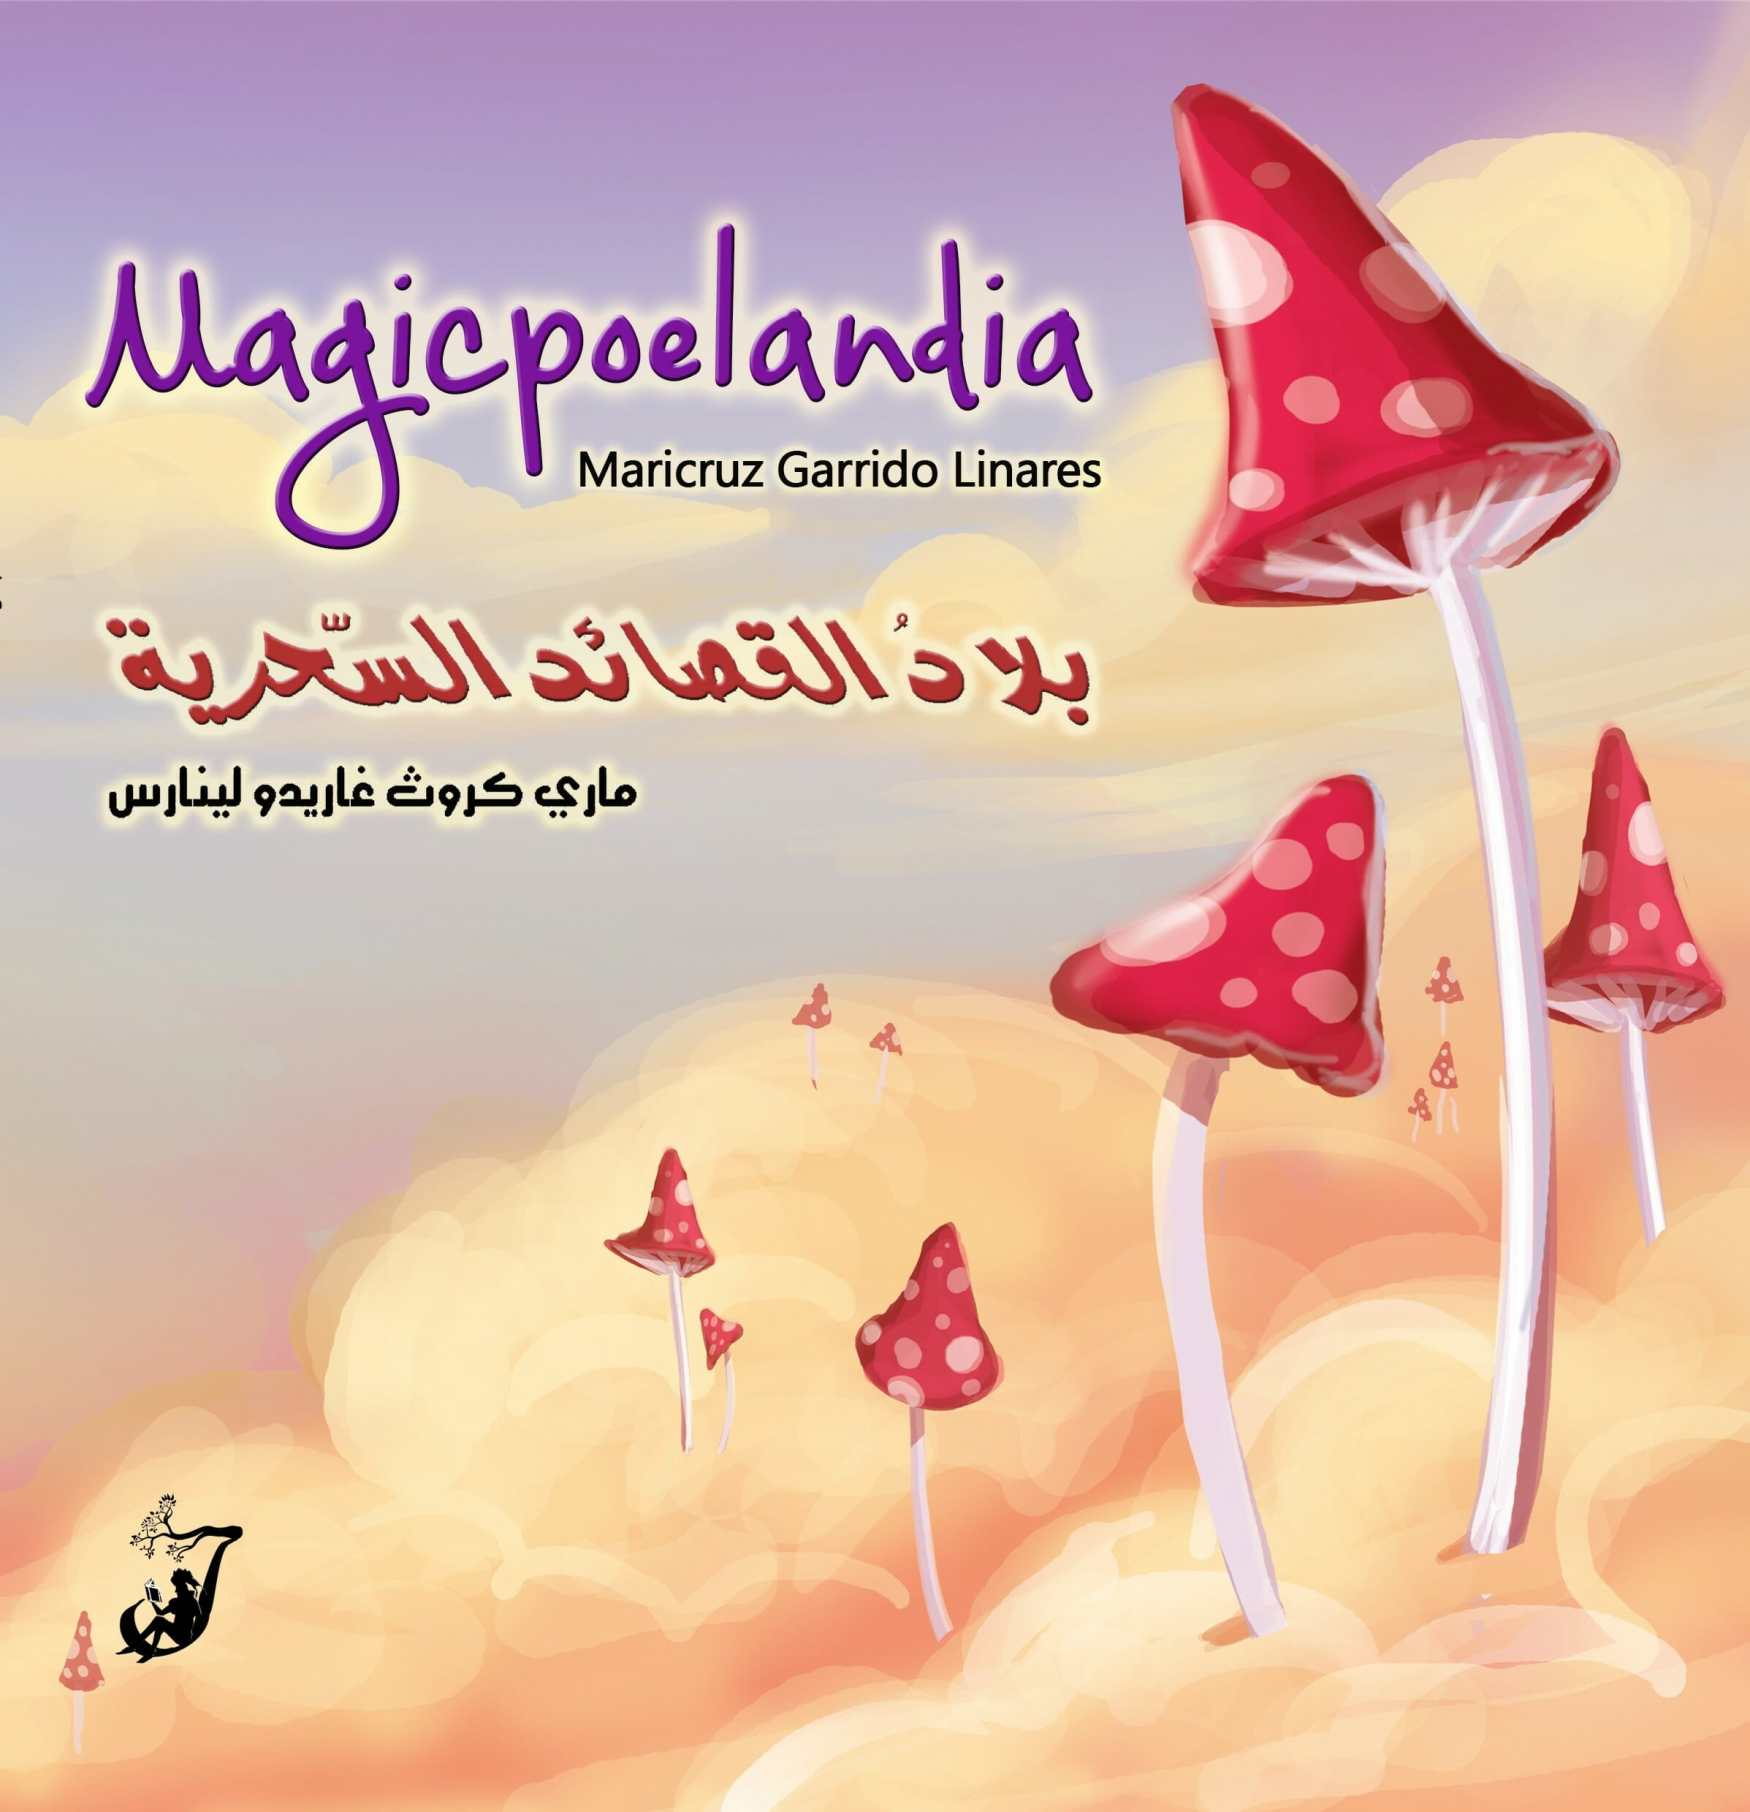 Magicpoelandia Español-árabe